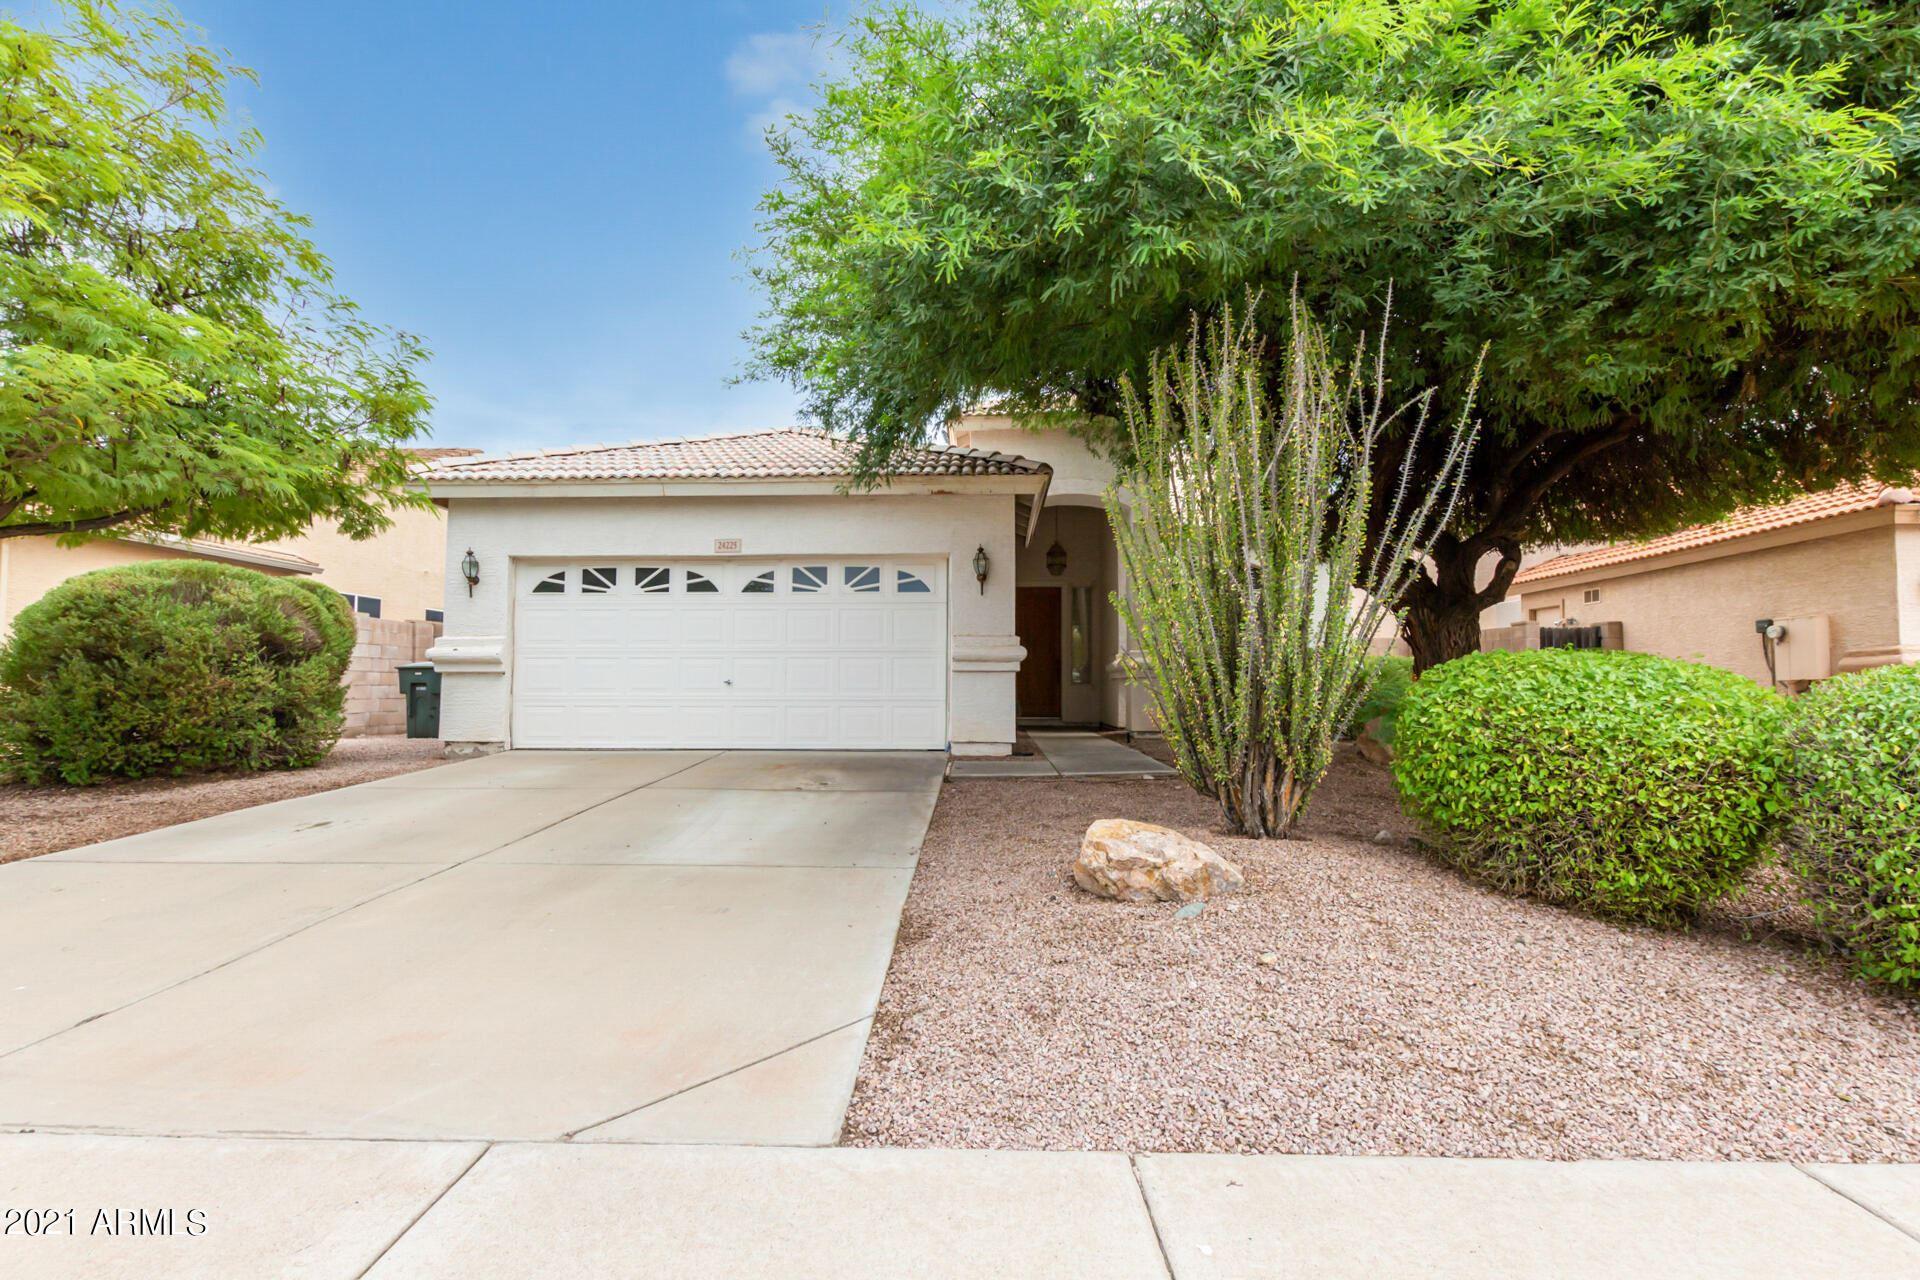 Photo of 24225 N 39TH Avenue, Glendale, AZ 85310 (MLS # 6295629)